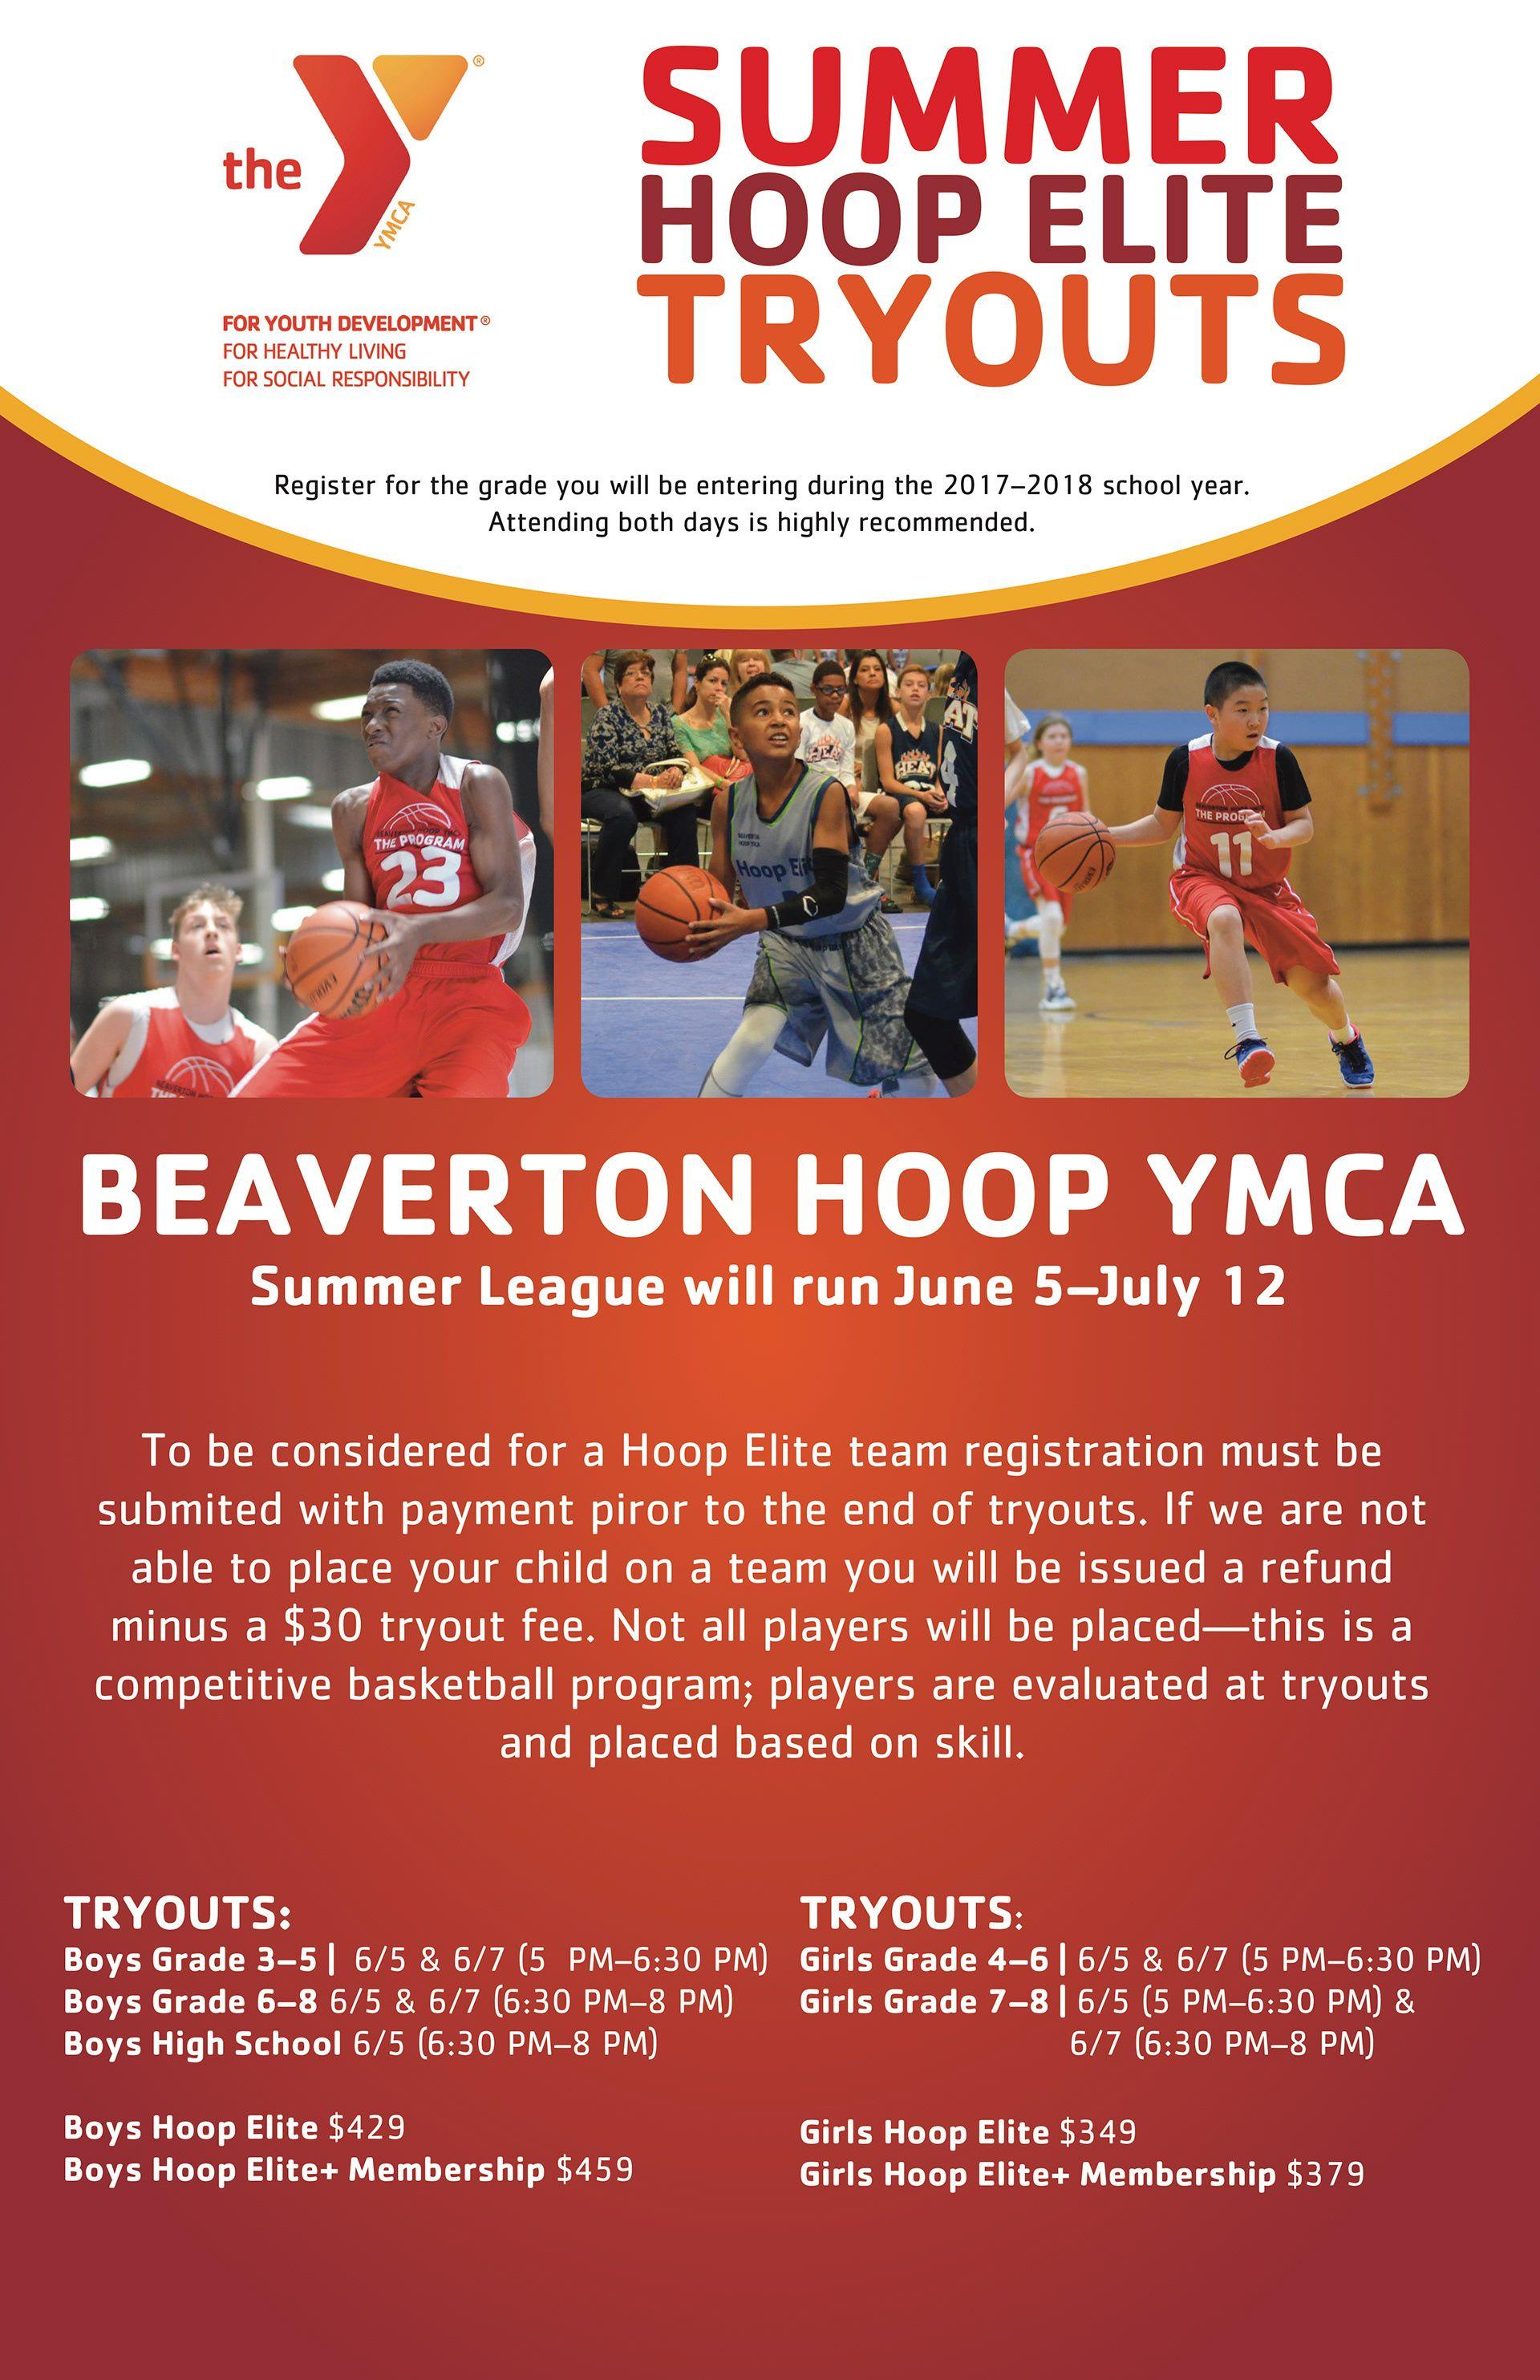 Ymca Of Columbia Willamette Poster Design Hoop Elite Department Basketball Academy Basketball Teams Basketbal Ymca Basketball Academy Soccer Problems